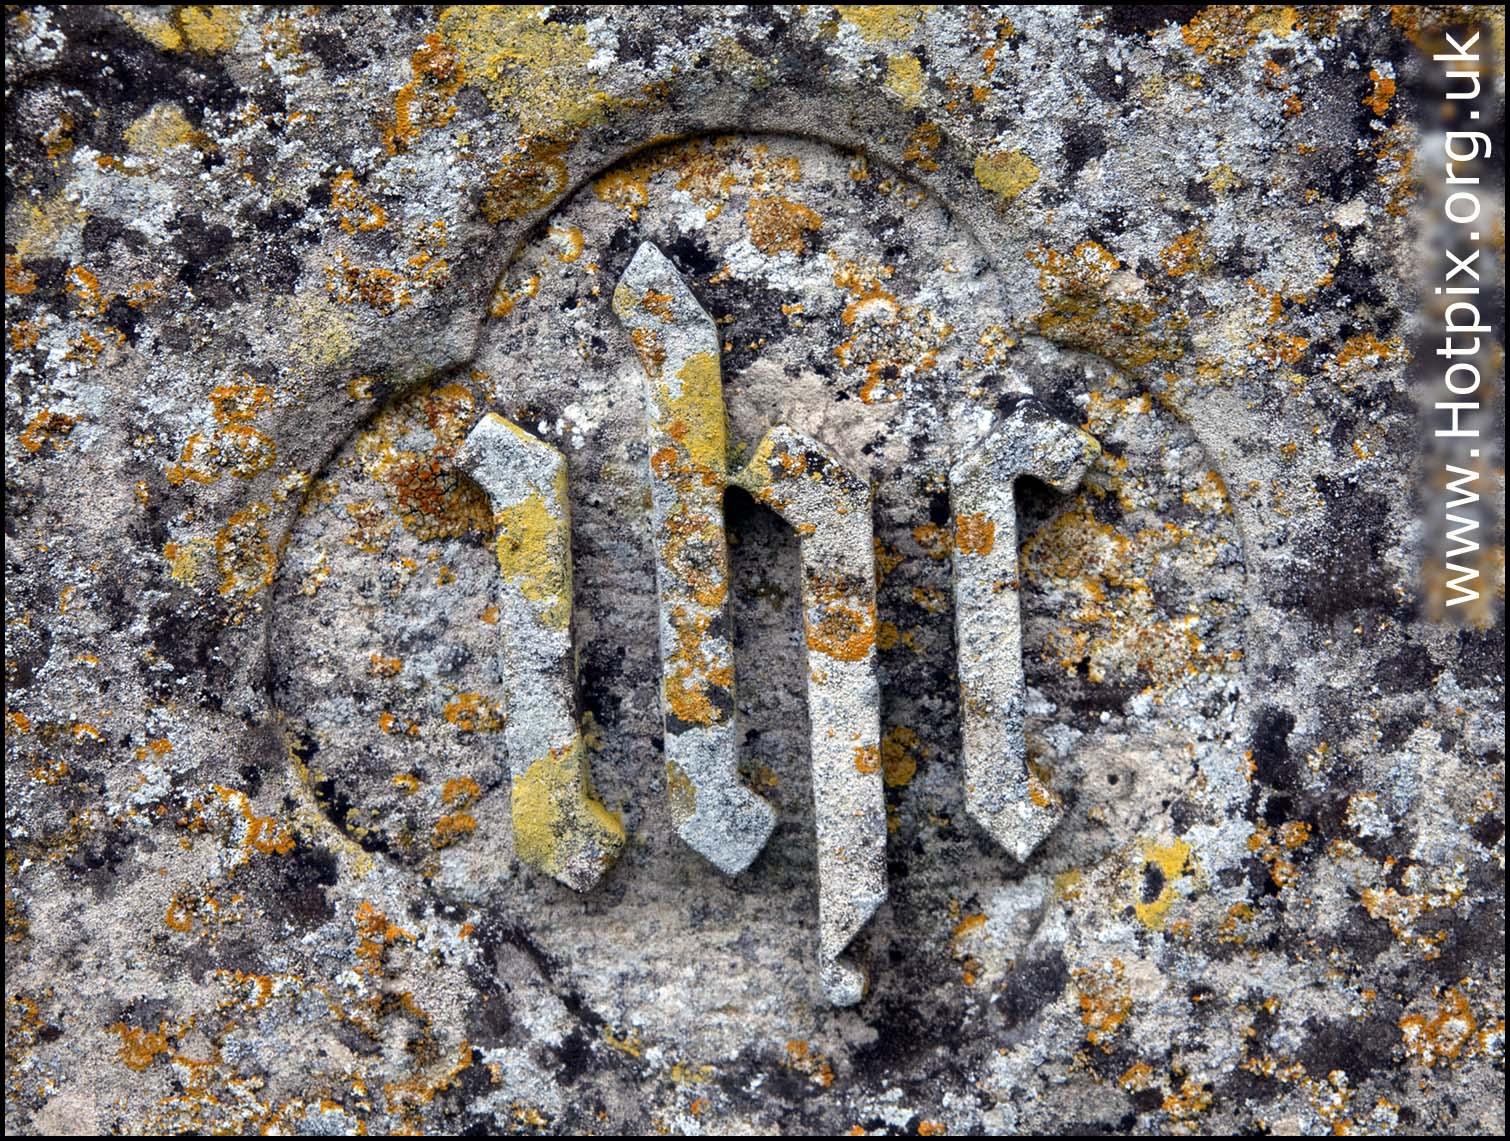 lichen,grave,stone,gravestone,churchyard,IHR,abstract,lime,limestone,UK,england,peterboro,hotpix,tonysmith,tony,smith,graves,tomb,tombs,cemetario,cemetary,cemetery,old,stuff,art,arty,history,muchacha,femenina,de,la,mujer,se\u00f1ora,lady,female,woman,girl,\u5973\u6027\u30e1\u30b9\u306e\u5973\u6027\u306e\u5973\u306e\u5b50,\u592b\u4eba\u5973\u6027\u5987\u5973\u5973\u5b69,fille,f\u00e9minine,femme,dame,#tonysmithhotpix